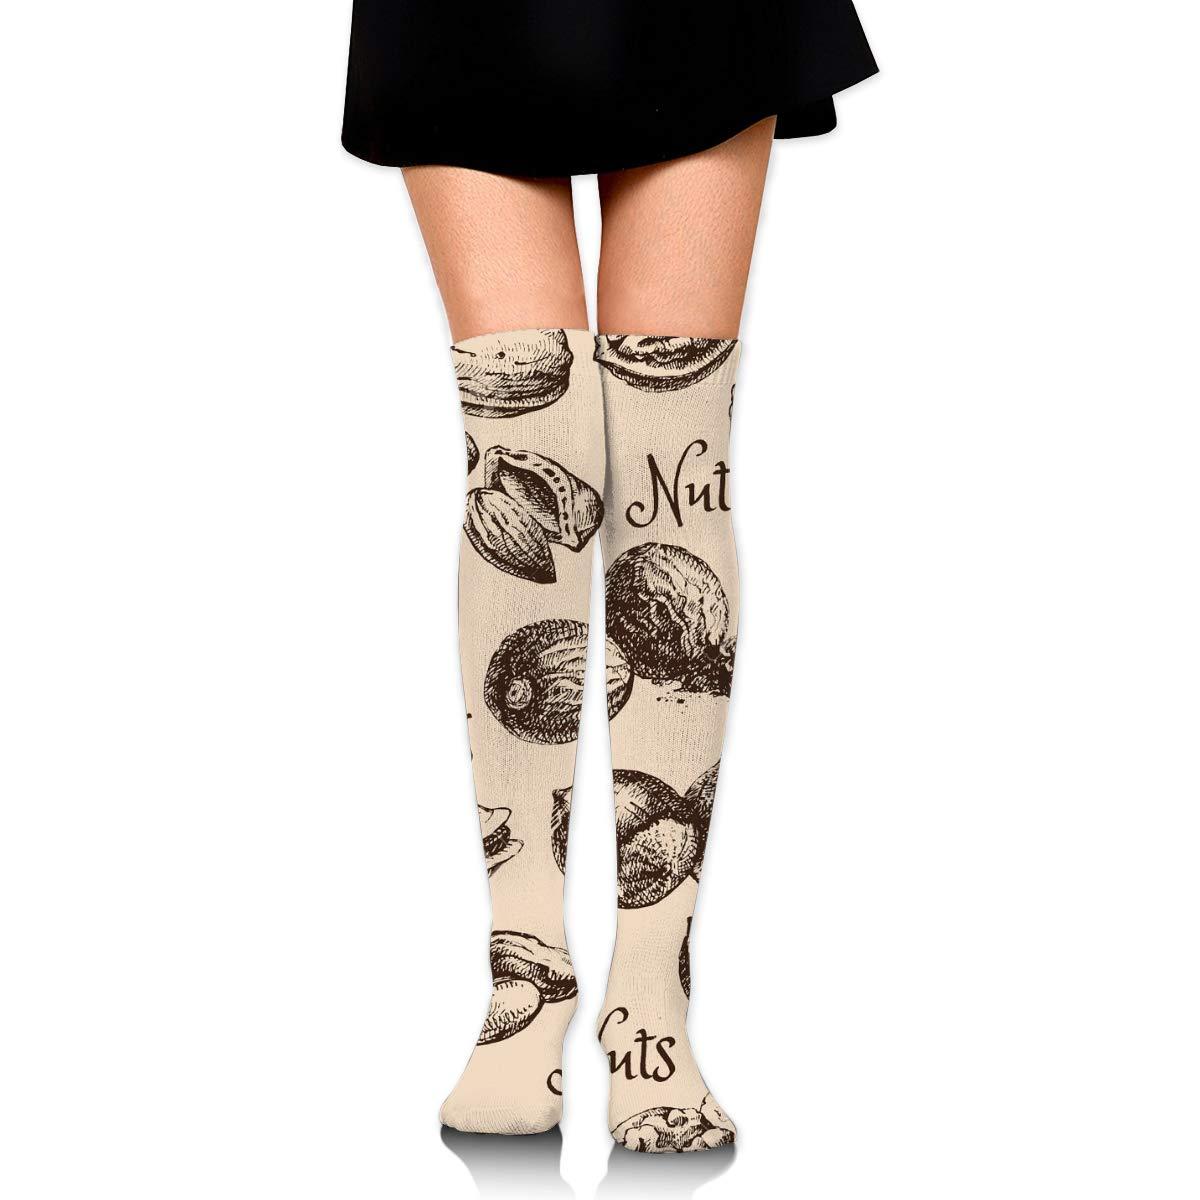 Kjaoi Girl Skirt Socks Uniform Nuts Pattern Women Tube Socks Compression Socks